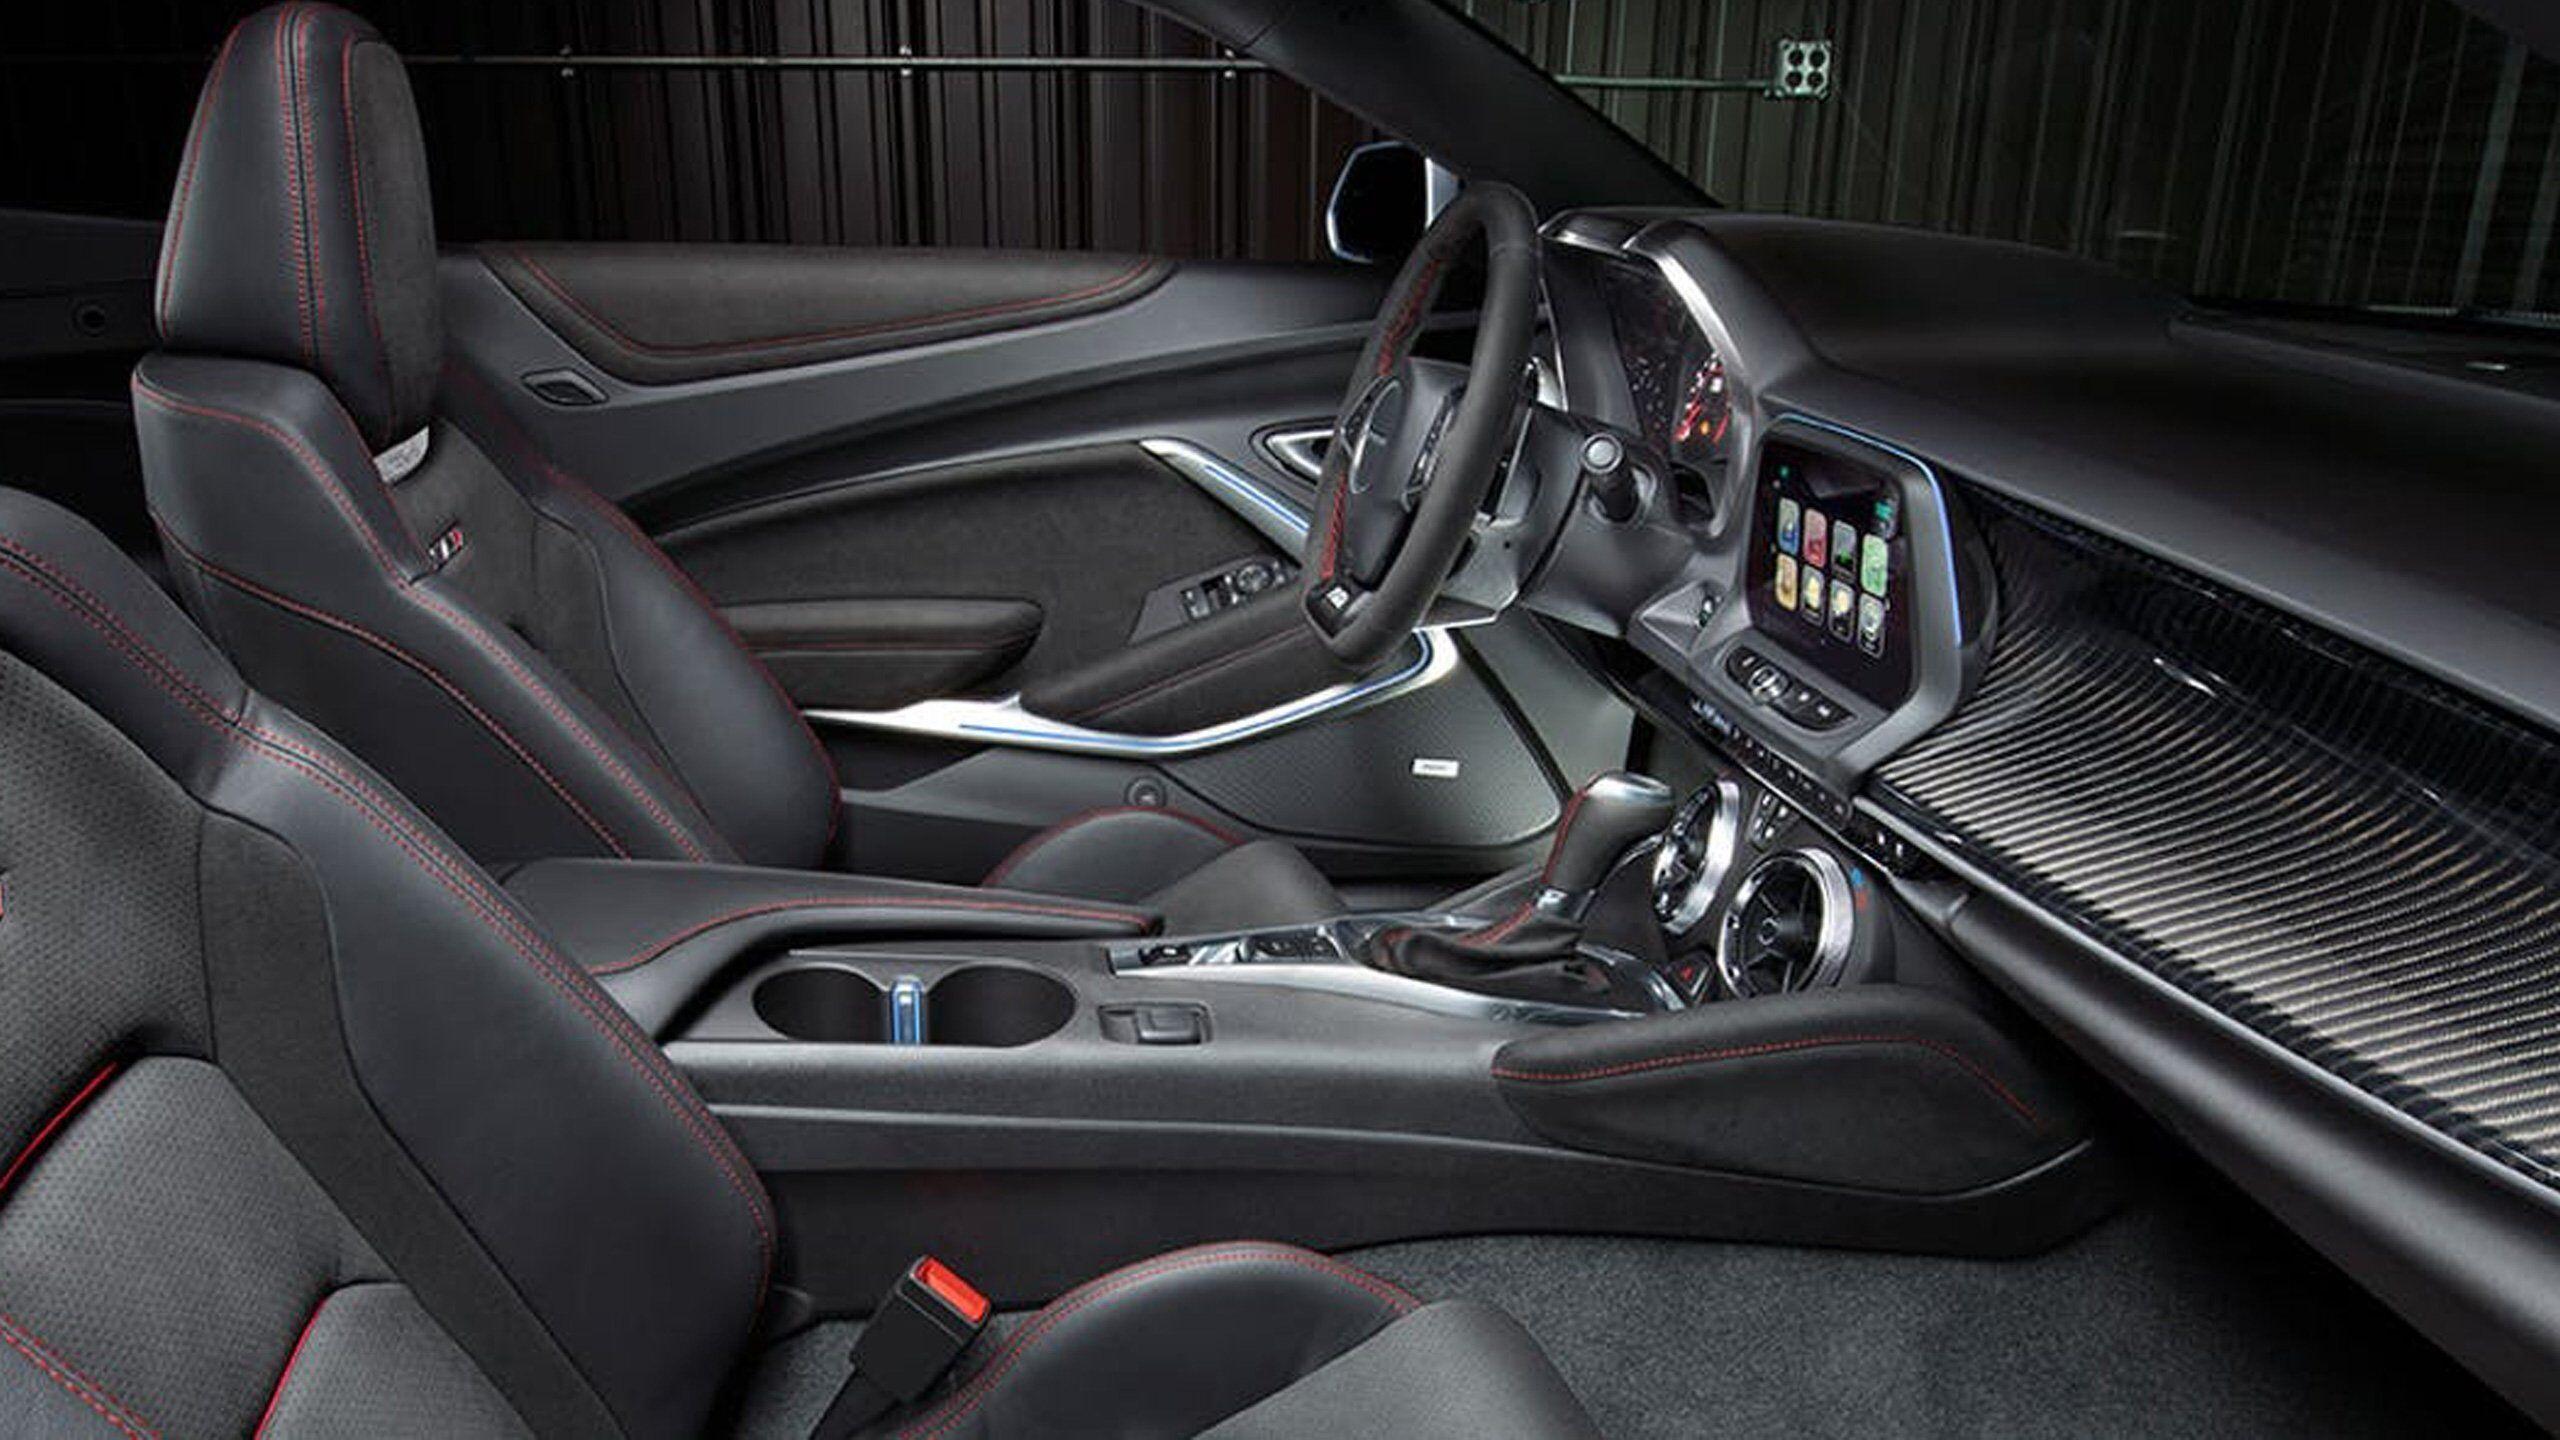 2017 Camaro ZL1 Interior